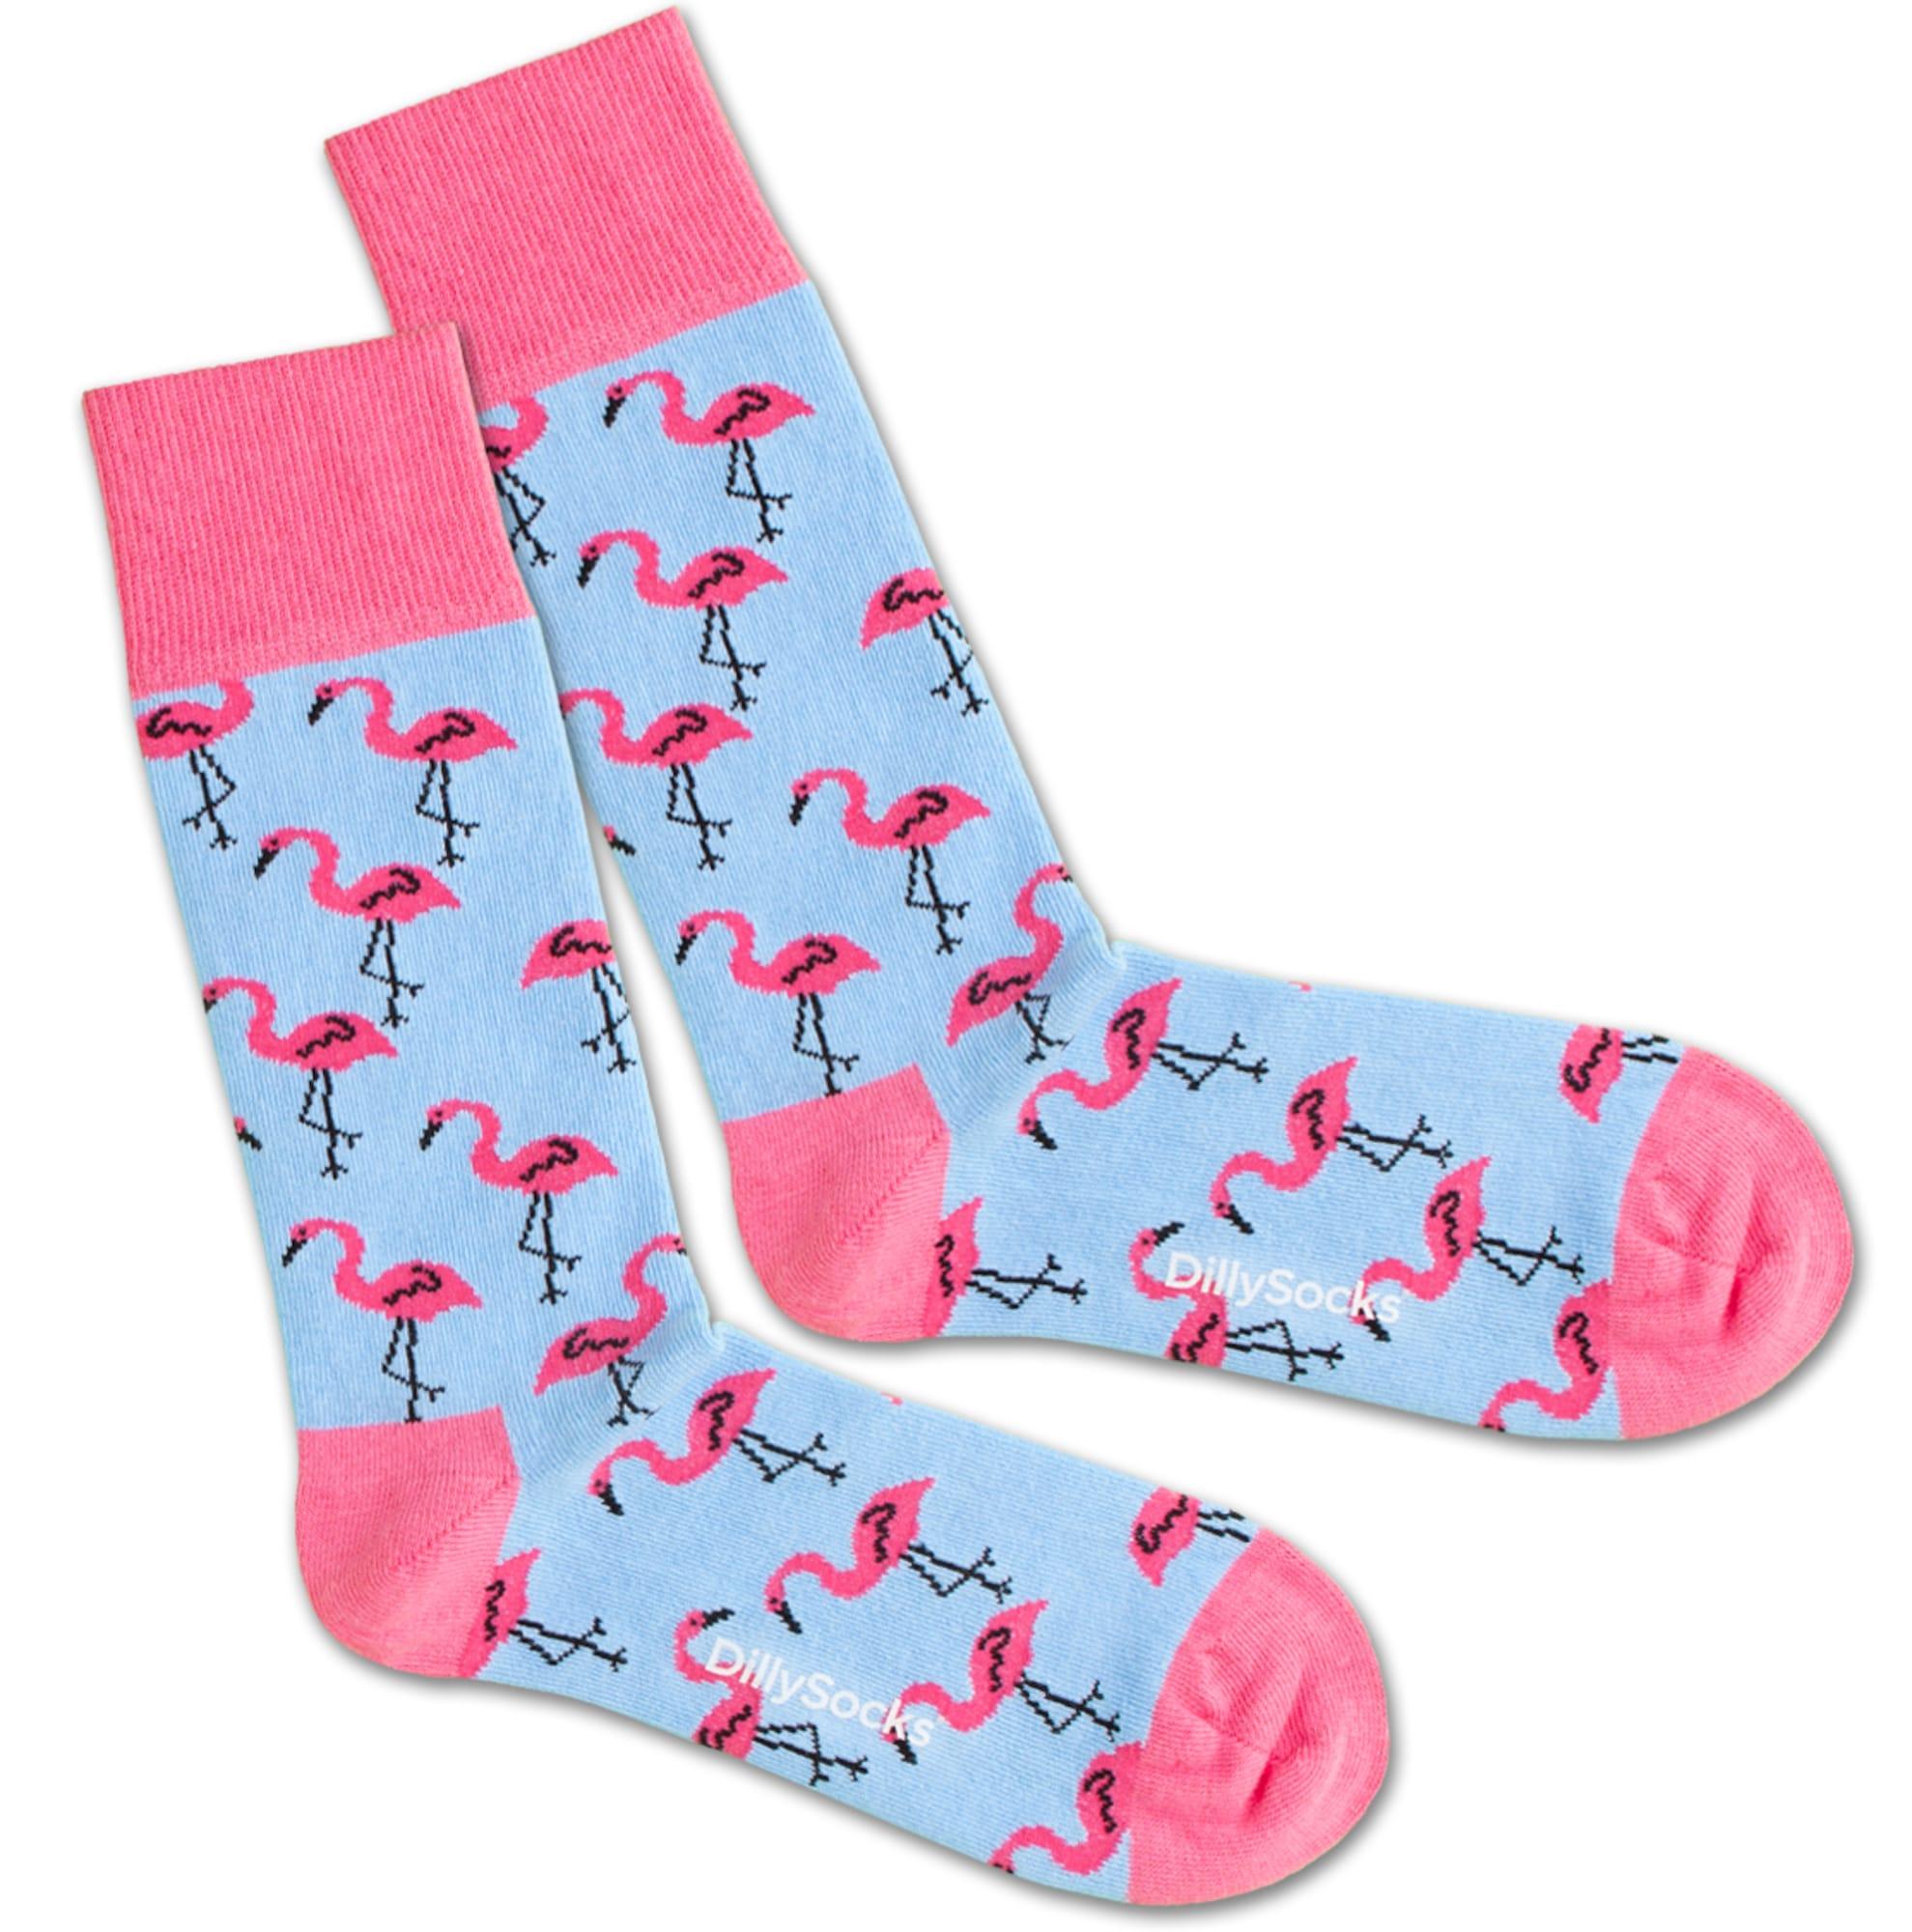 Ponožky Flamingo Sky modrá pink DillySocks